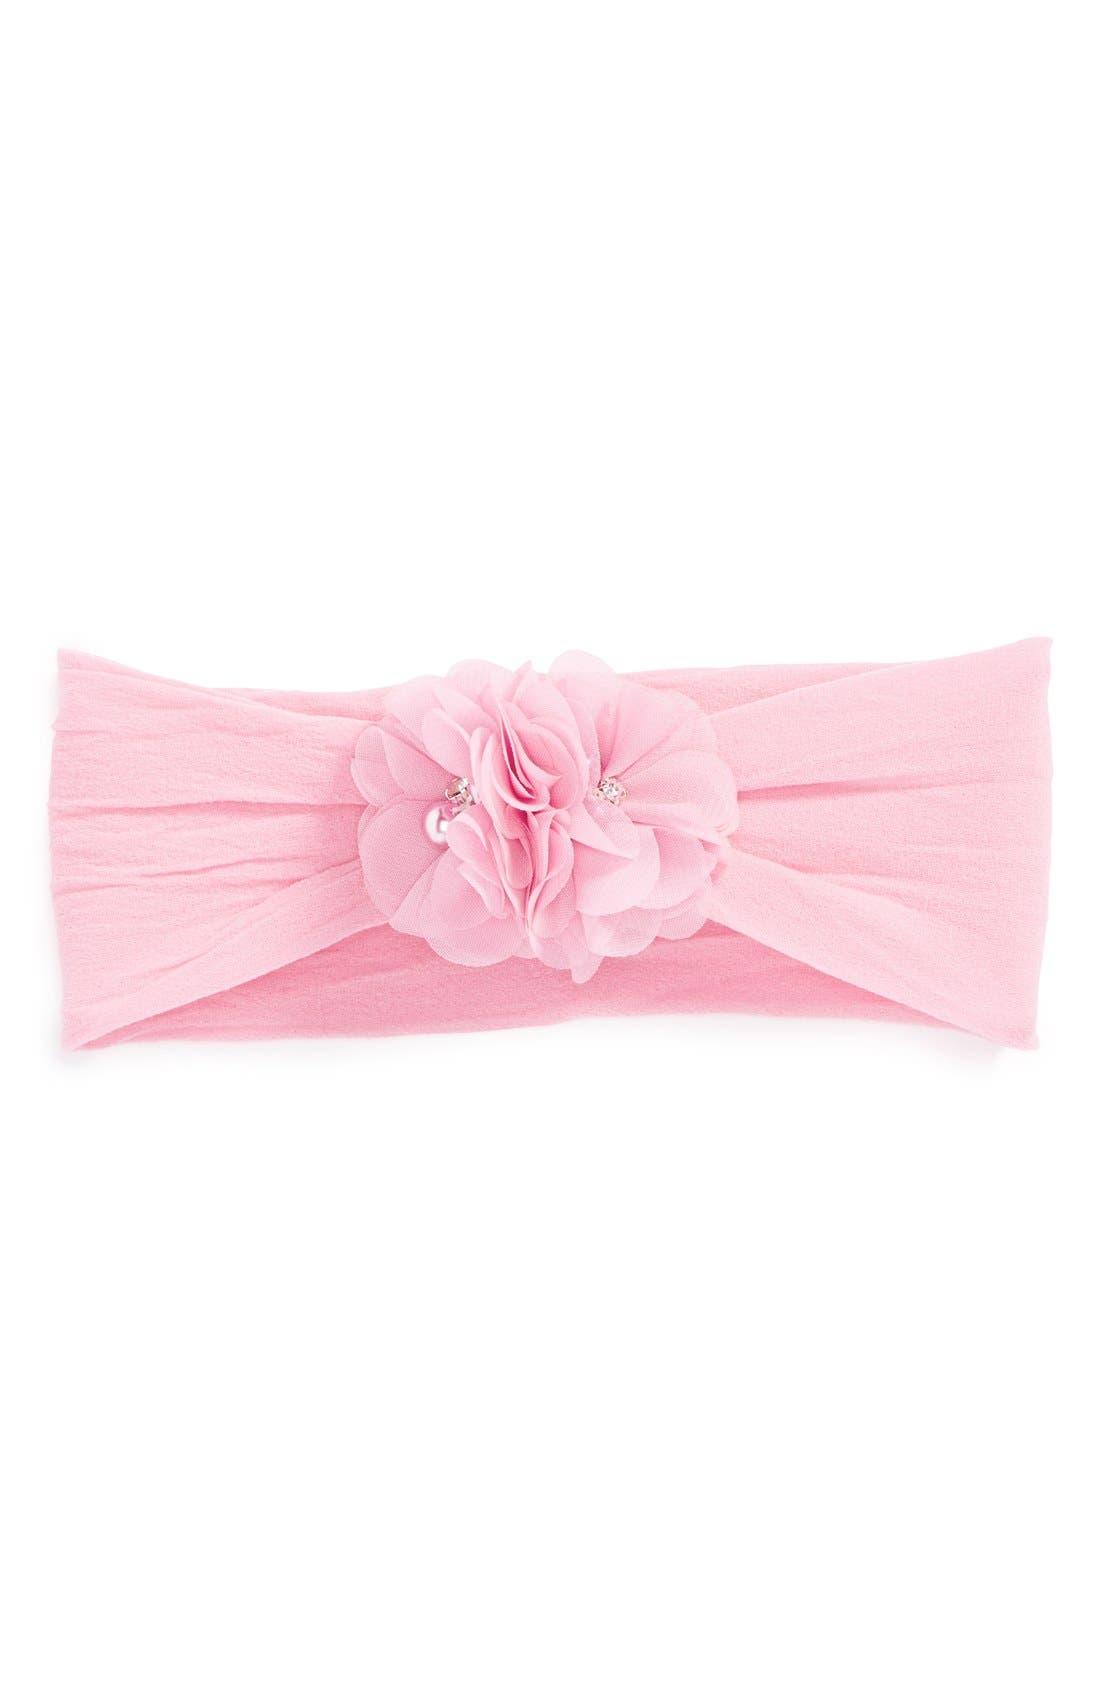 Alternate Image 1 Selected - Baby Bling Chiffon Bouquet Headband (Baby Girls)